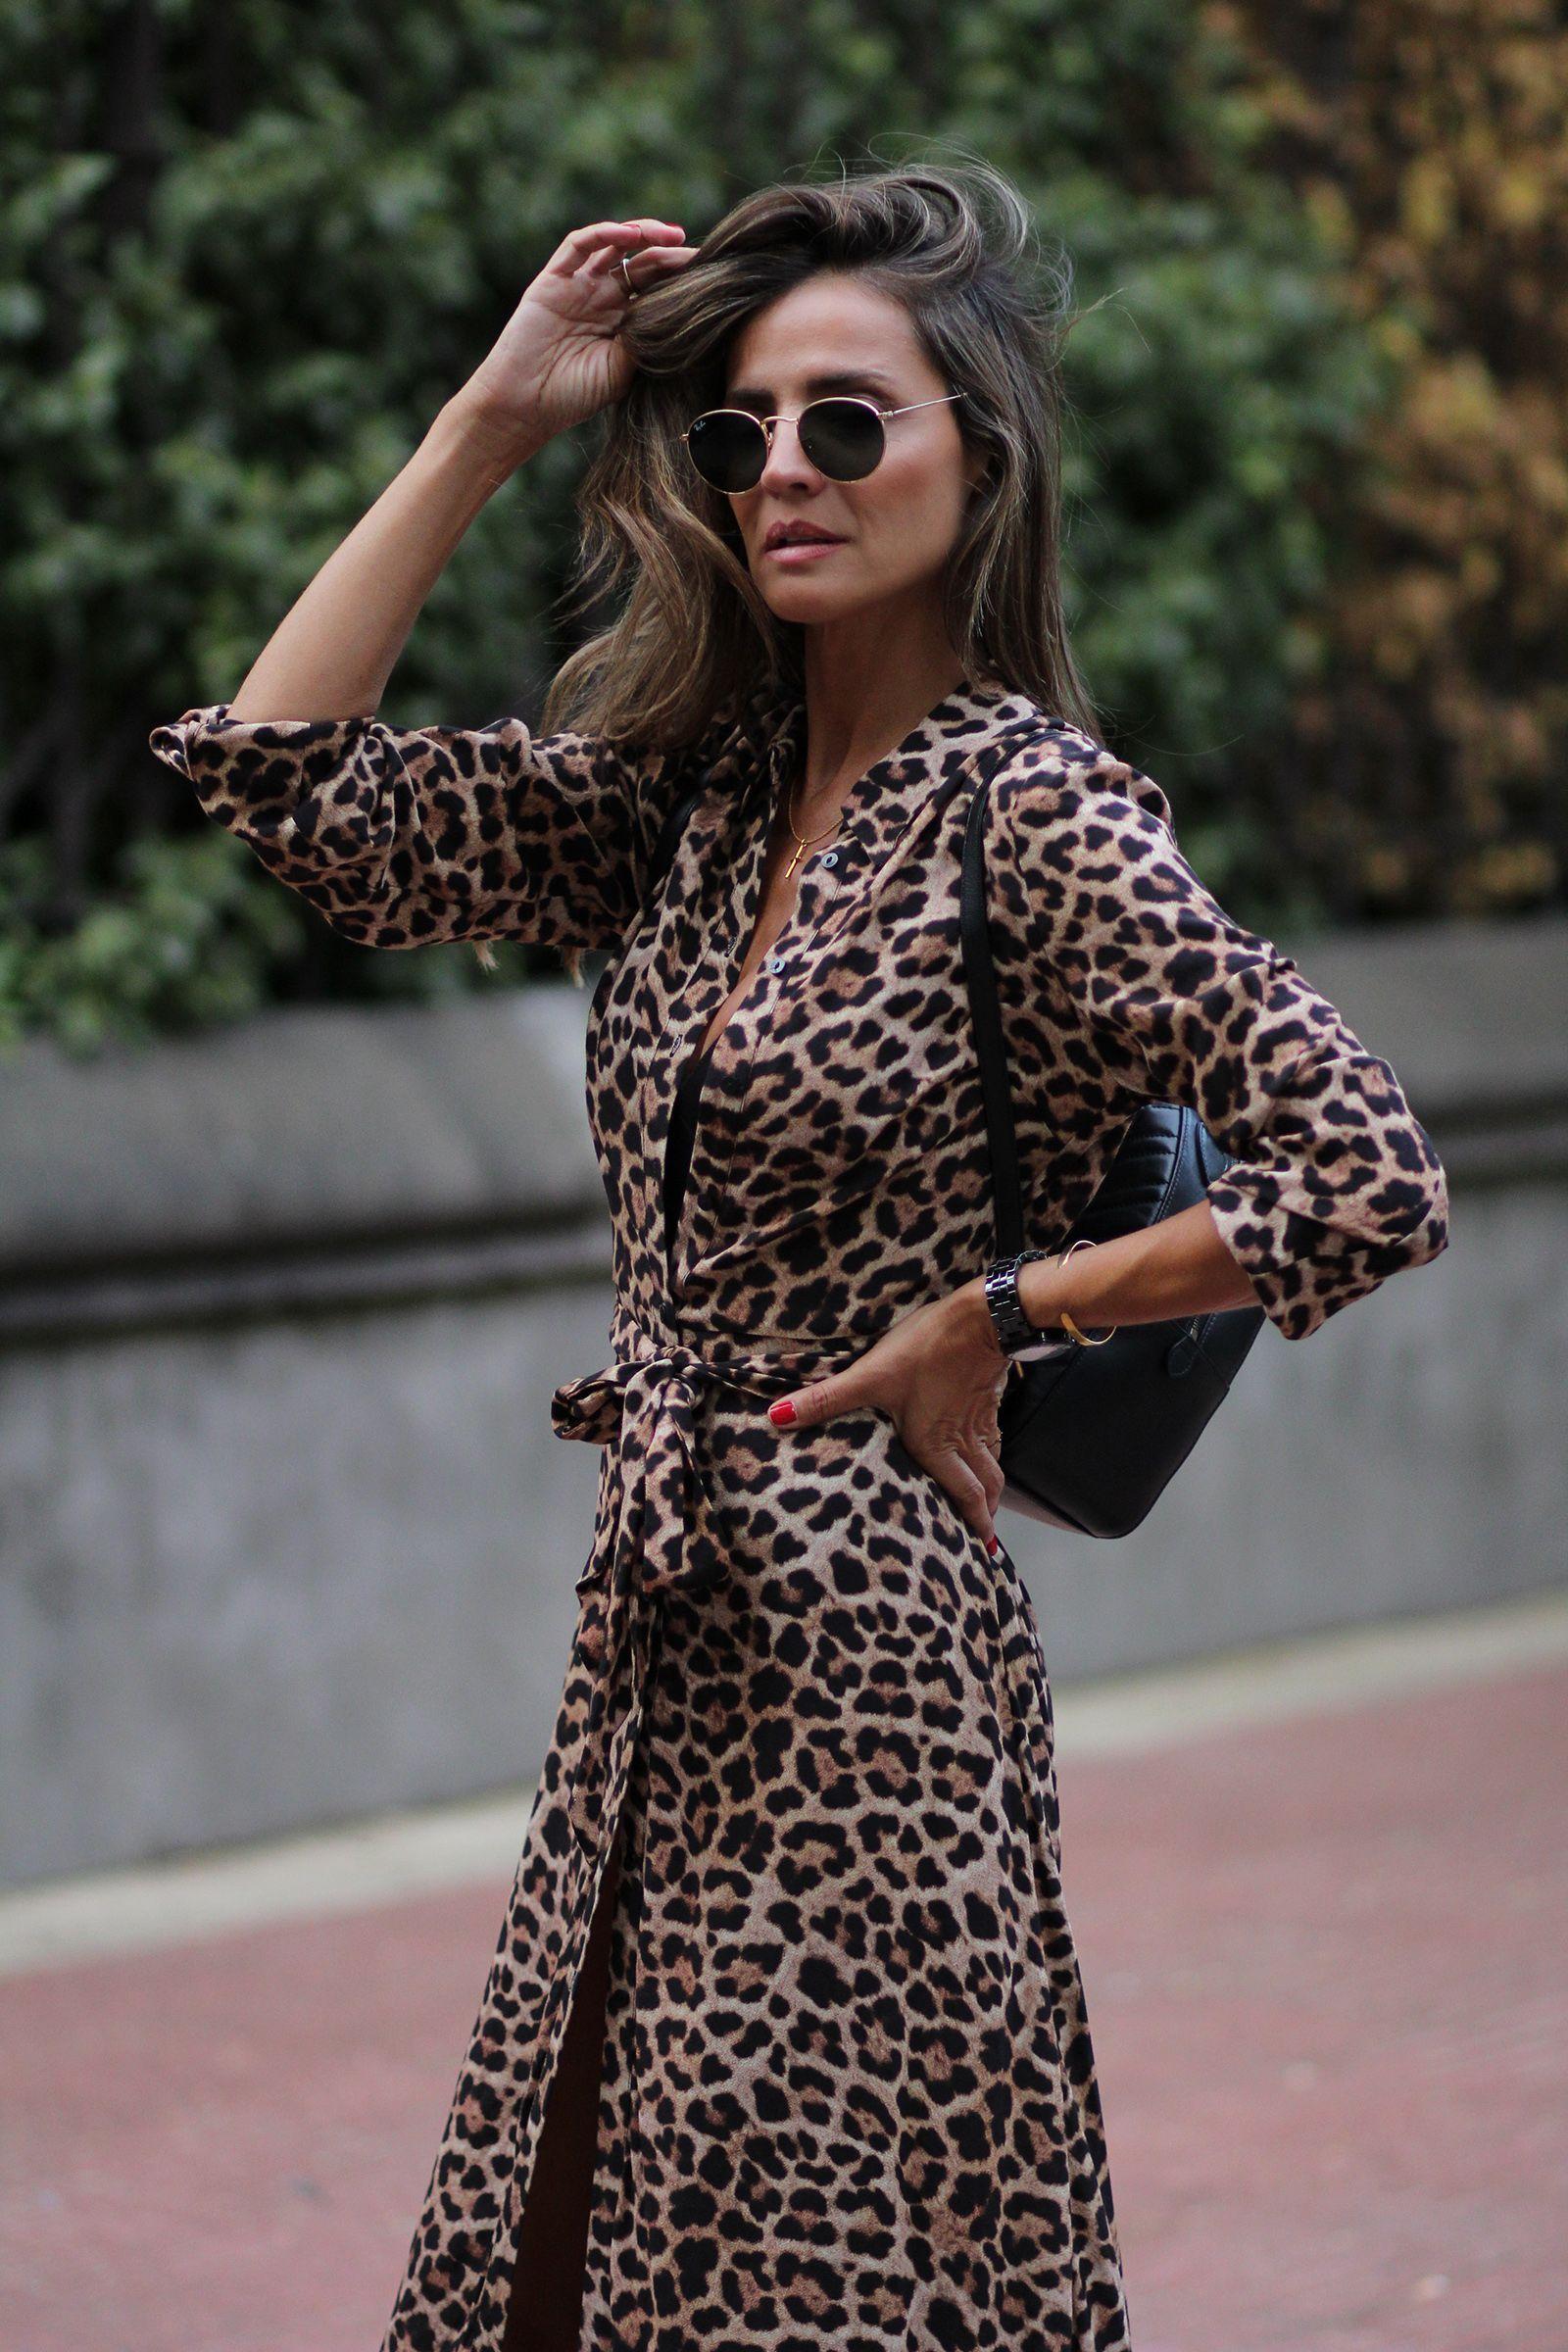 37544ea7e Lady Addict con vestido de leopardo